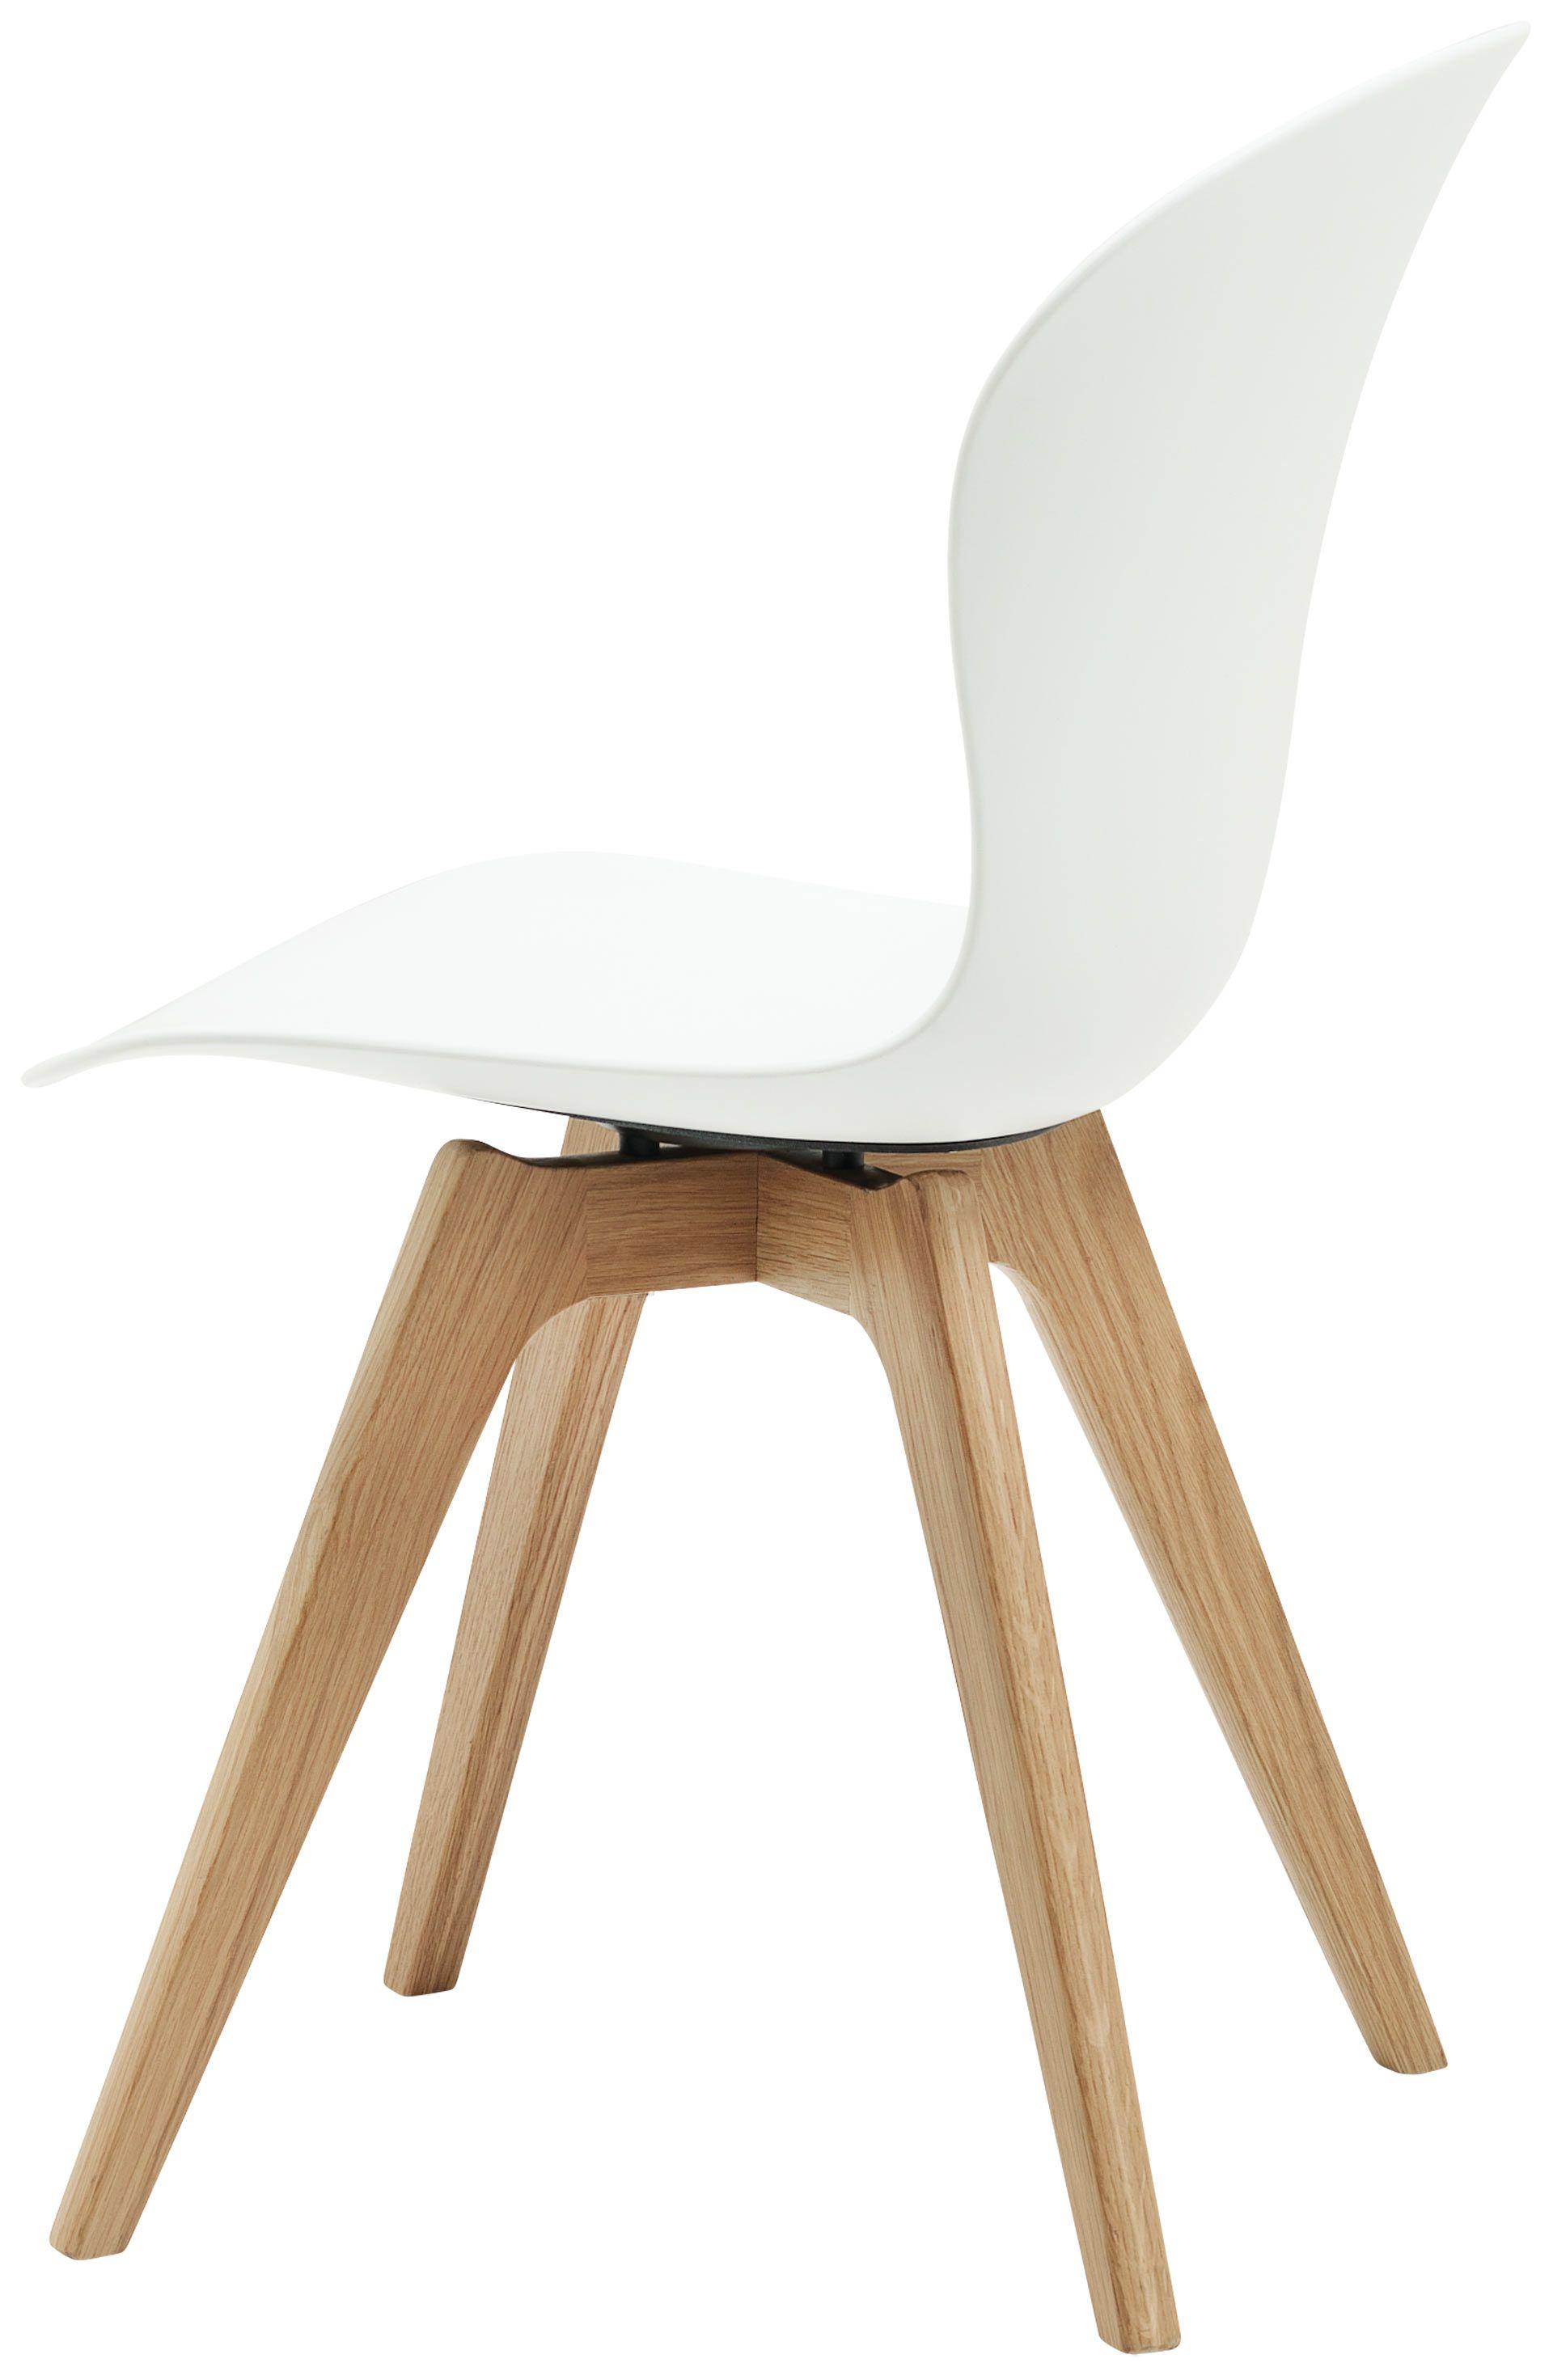 Modern Dining Chairs  Designer Dining Chairs   BoConcept Furniture Sydney  Australia. Modern Dining Chairs  Designer Dining Chairs   BoConcept Furniture